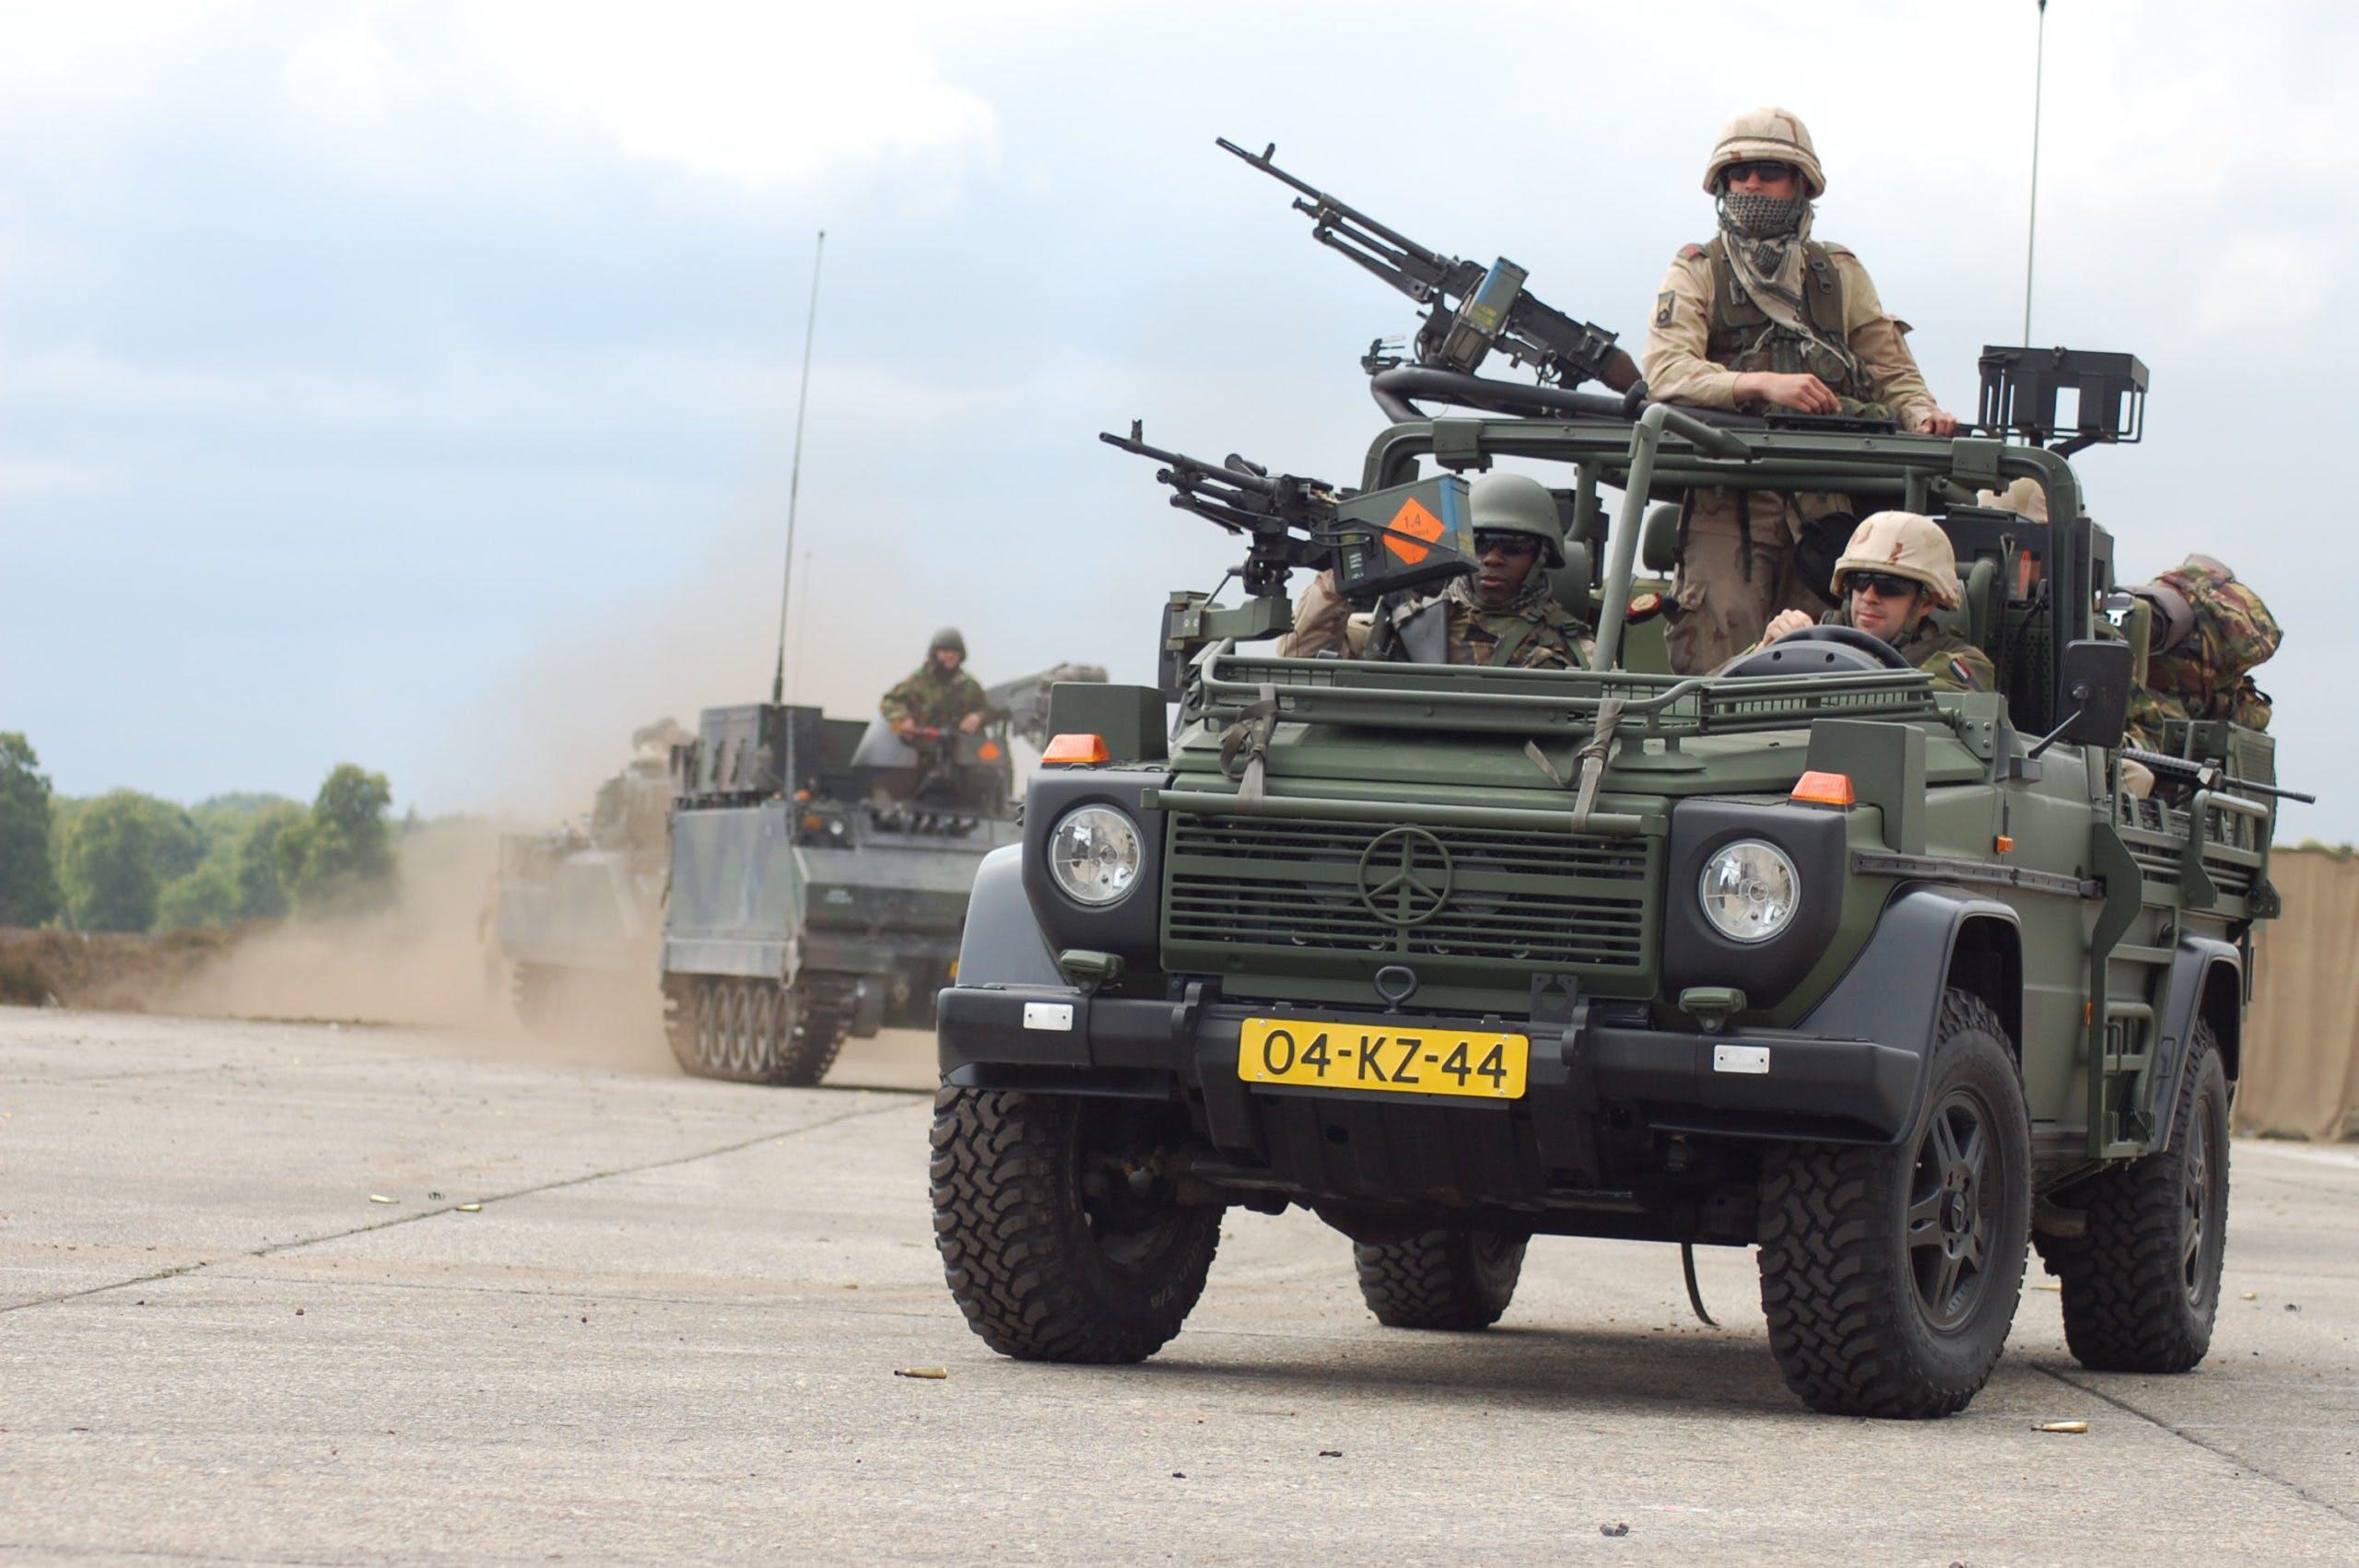 mercedes-benz Classe G militare